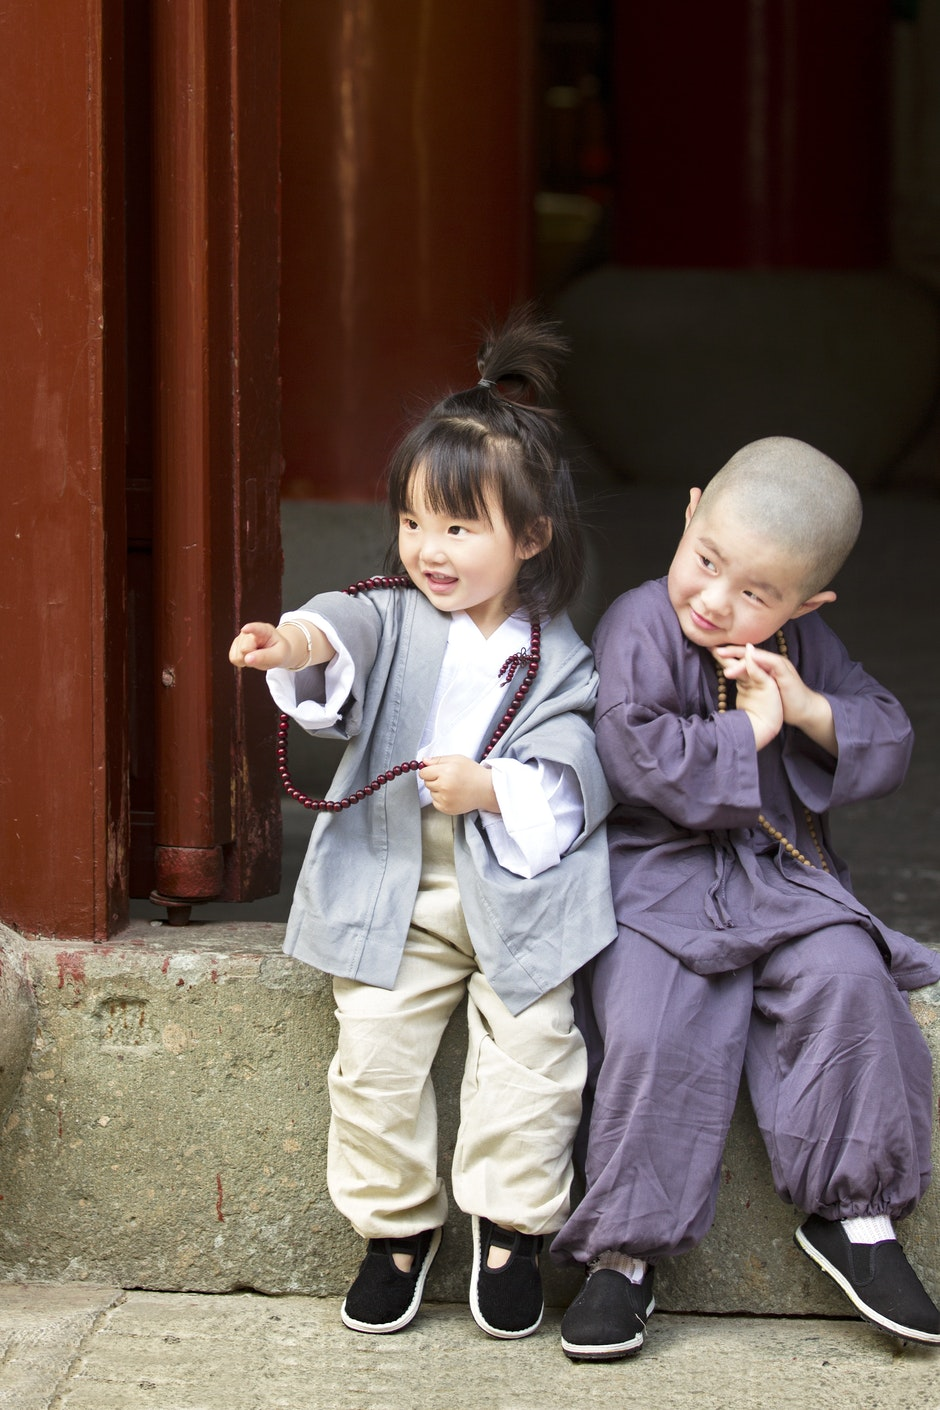 Asian, boy, child